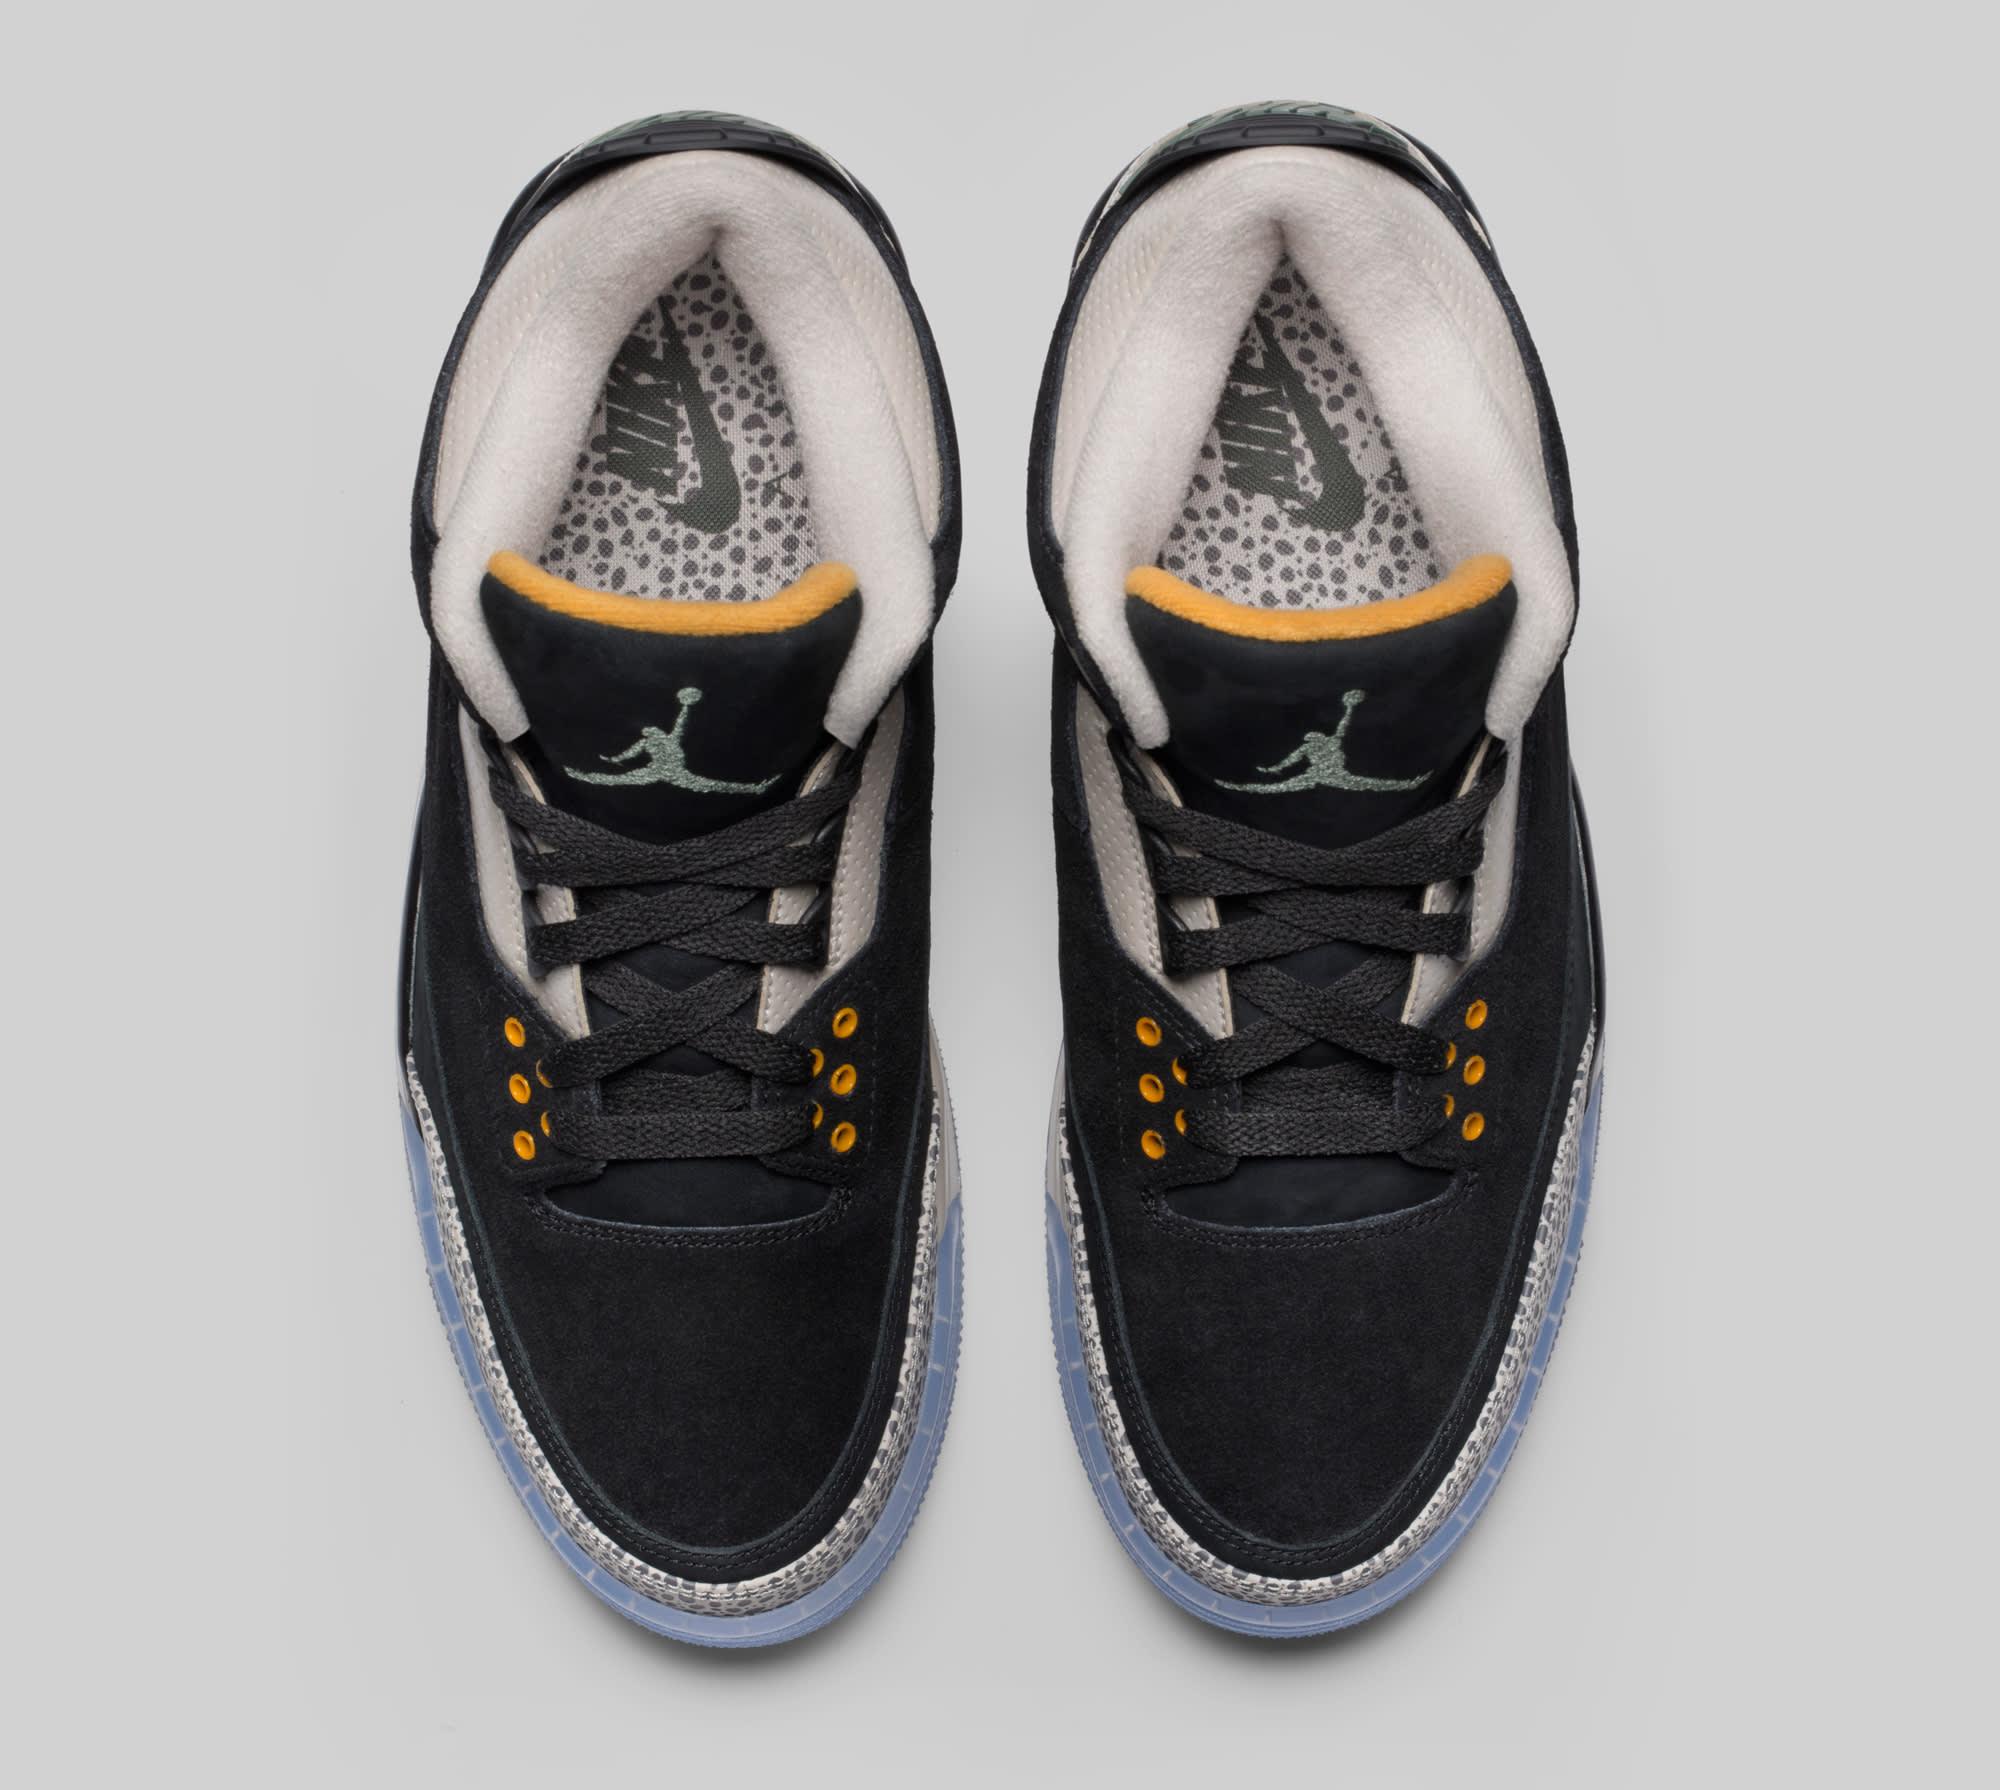 Atmos Air Jordan 3 Top